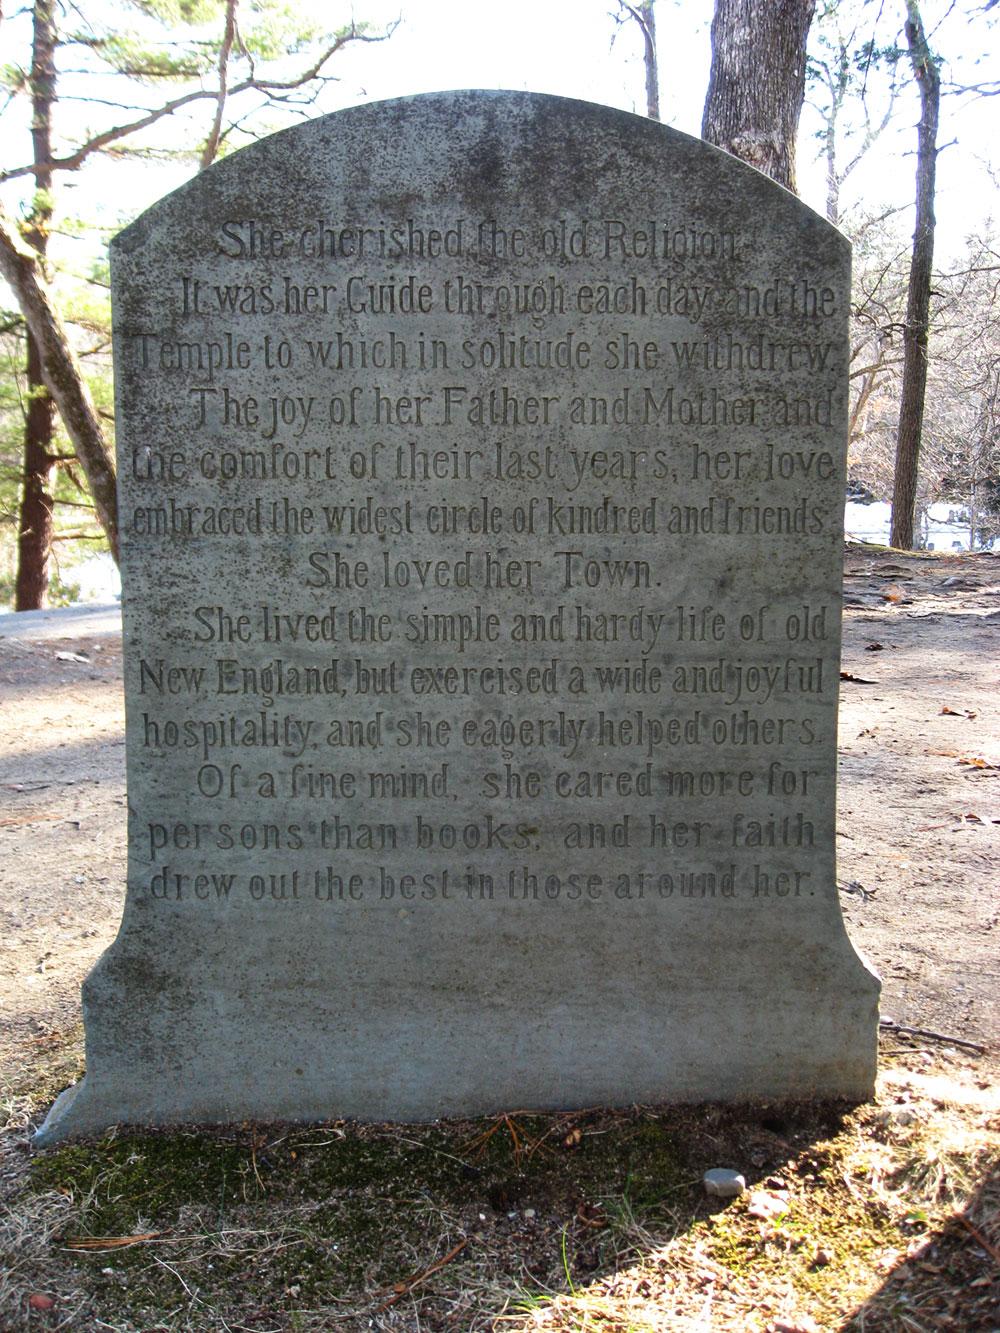 North American Cemeteries: Waldo Emerson - Sleepy Hollow